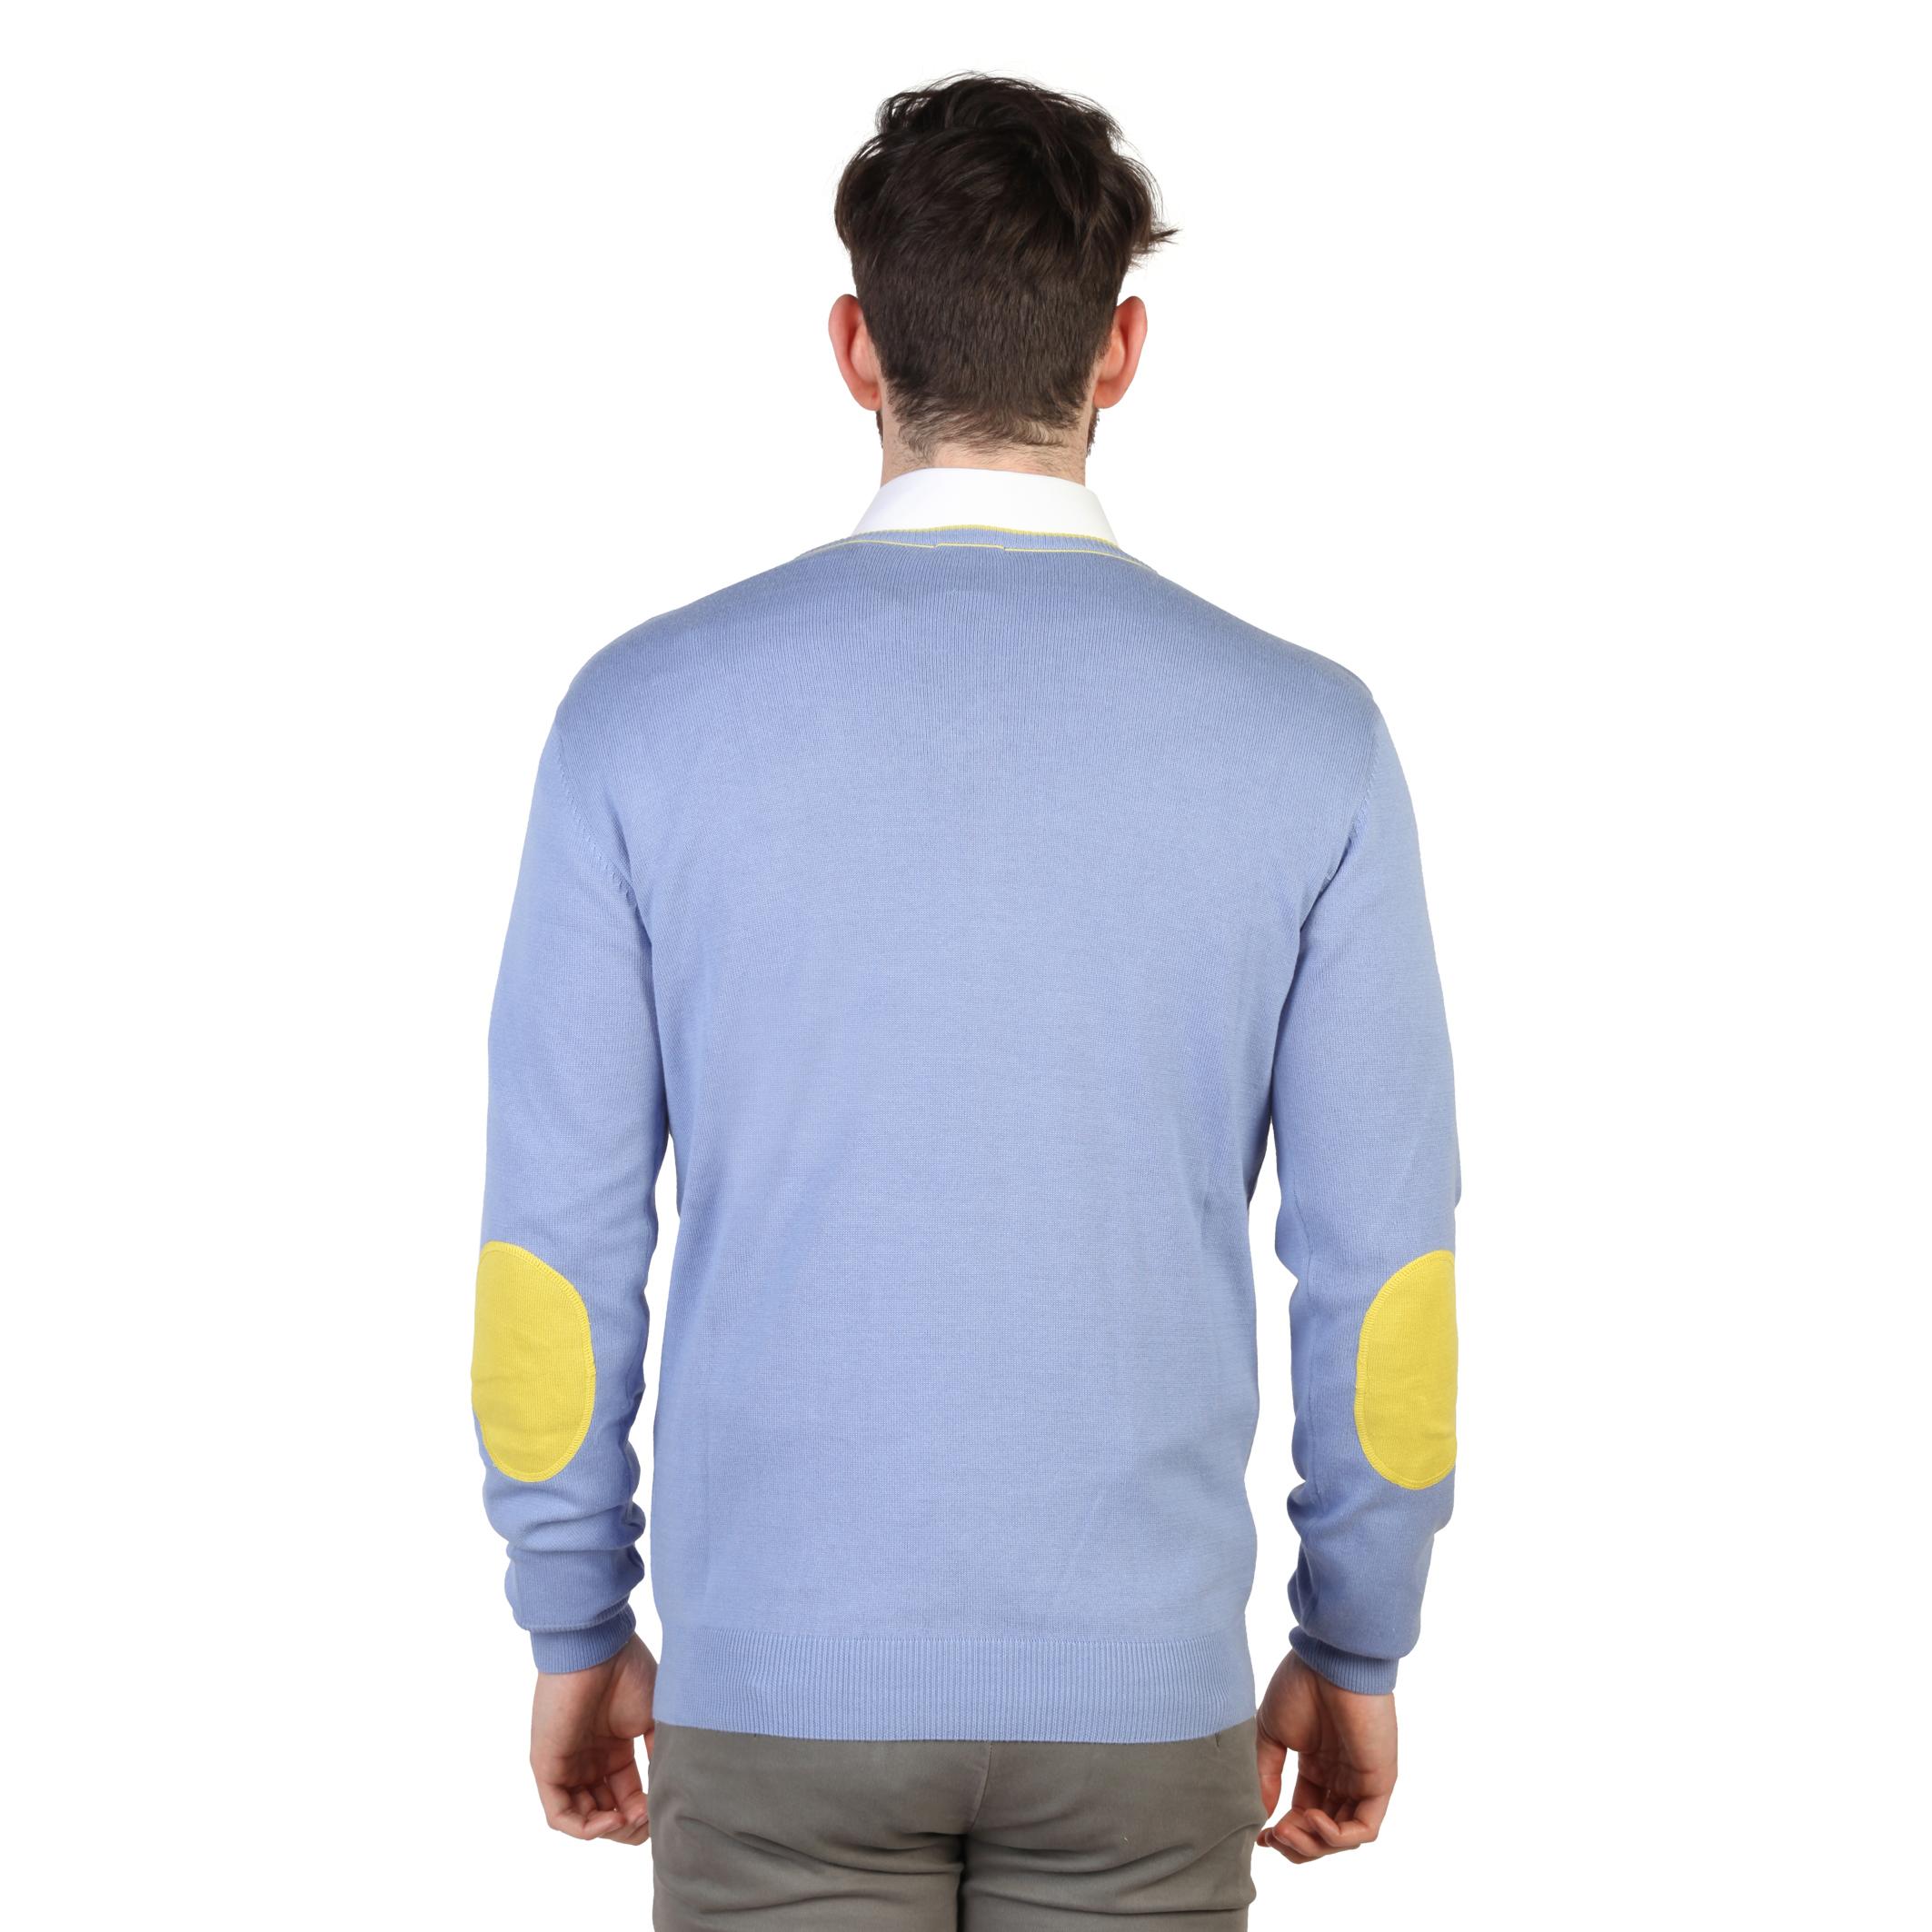 Pulls-U-S-Polo-Homme-42353-50357-Rouge-Bleu-Bleu